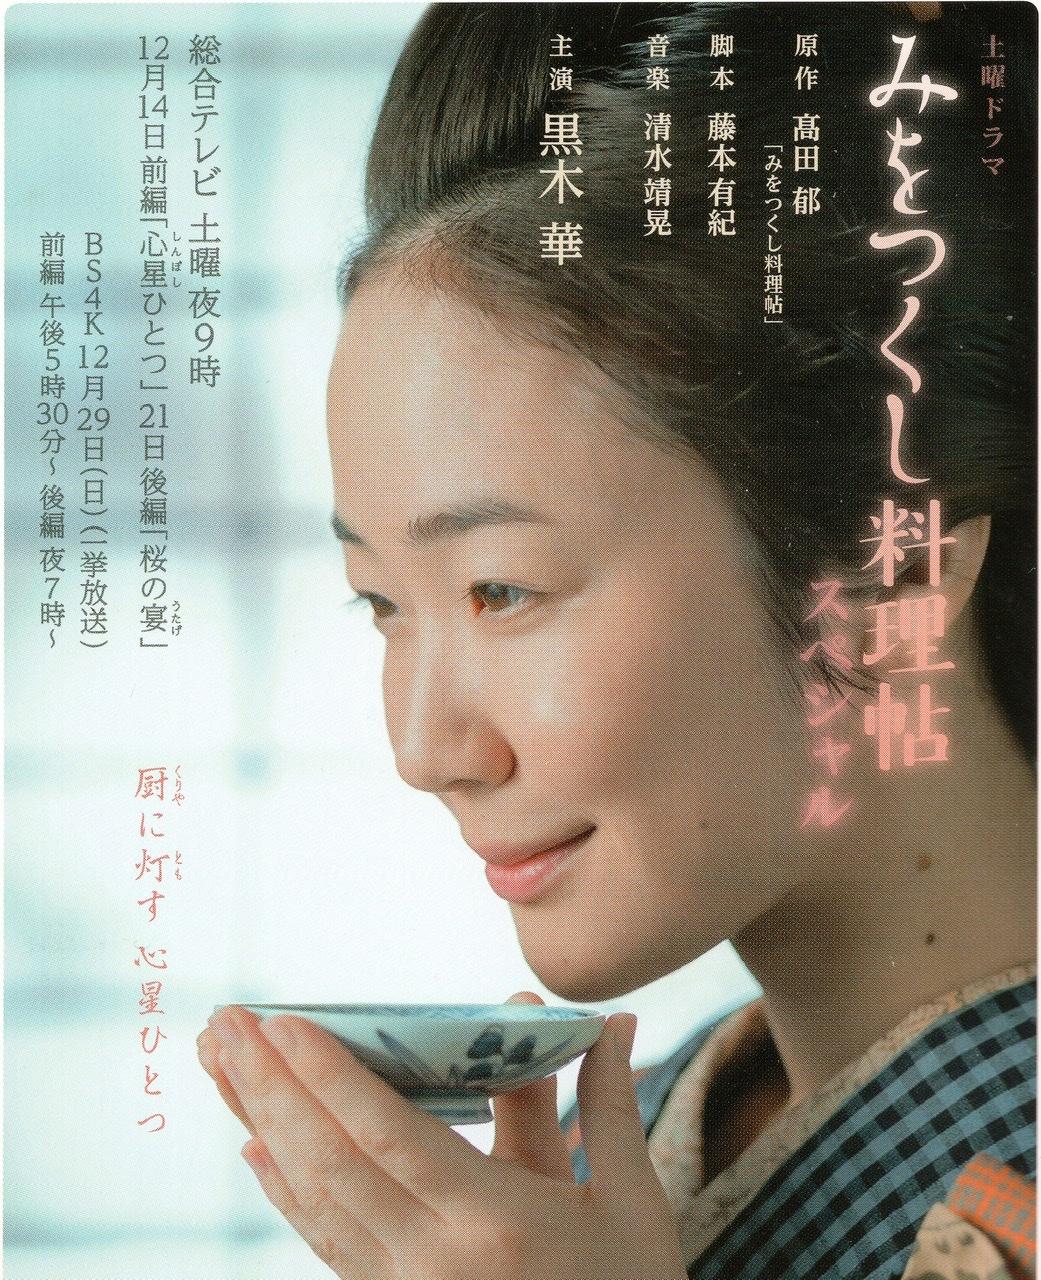 NHK「みをつくし料理帖」スペシャルポスター